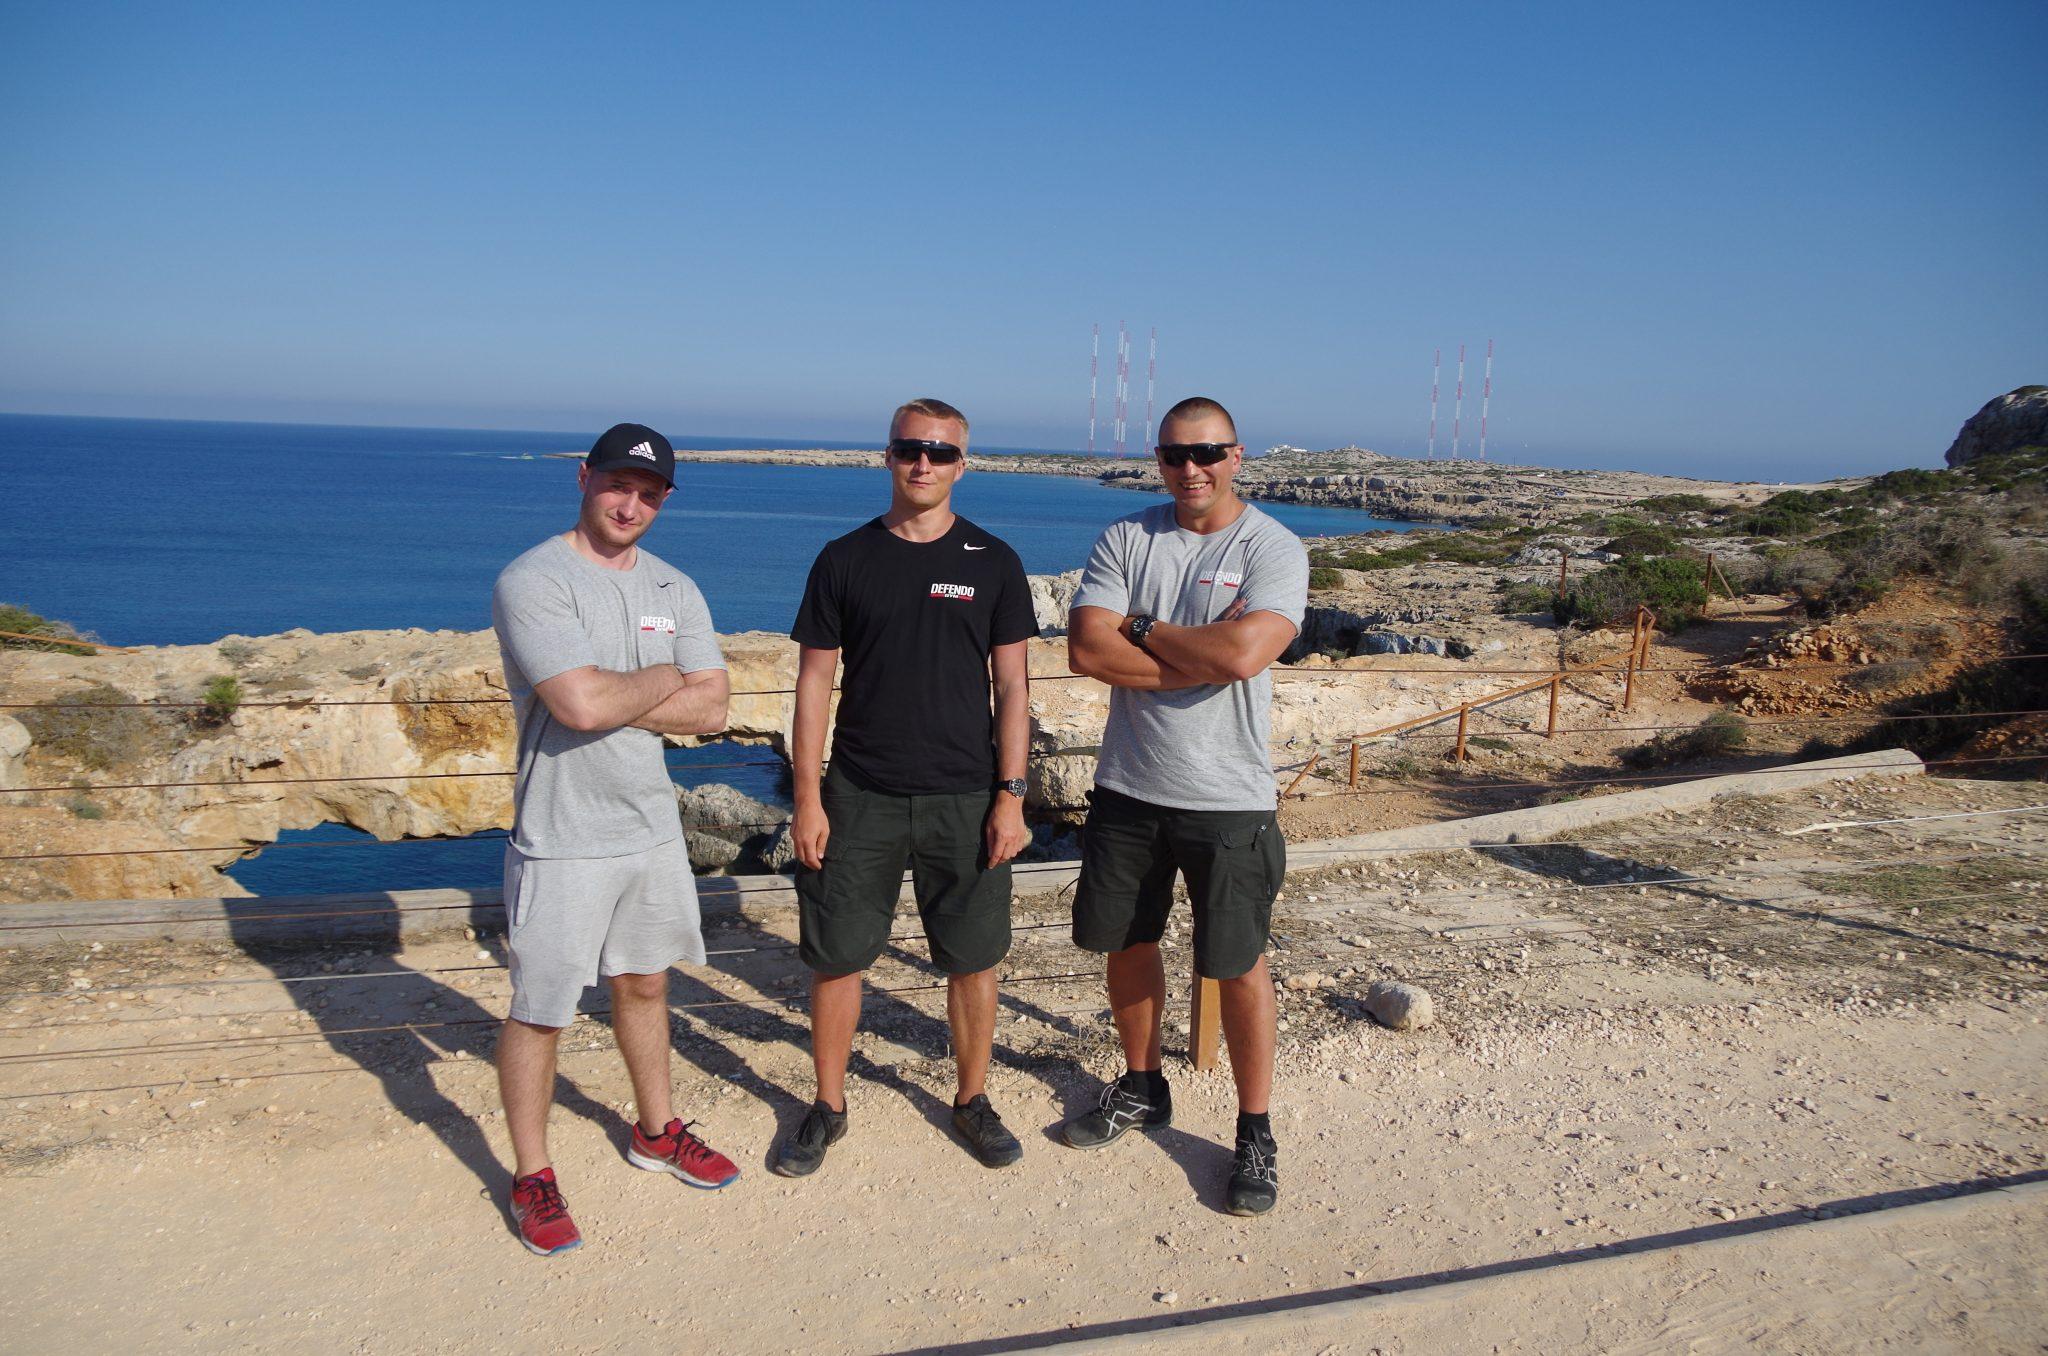 Cypr - Naturalny most, Cape Greko